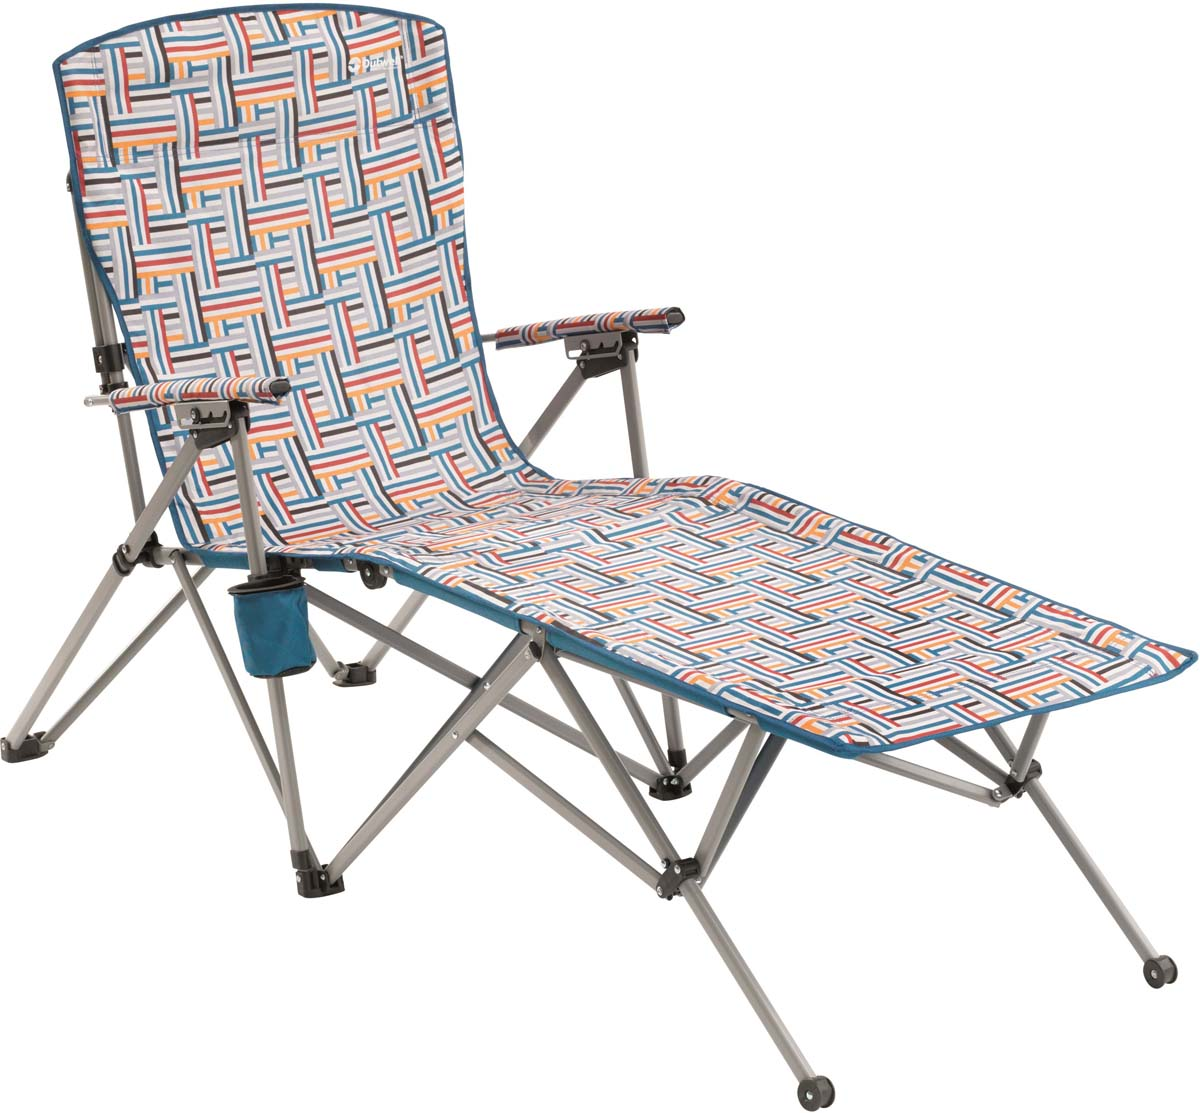 цена на Кресло-шезлонг складное Outwell Leona Summer, 54/65 х 173 х 106 см